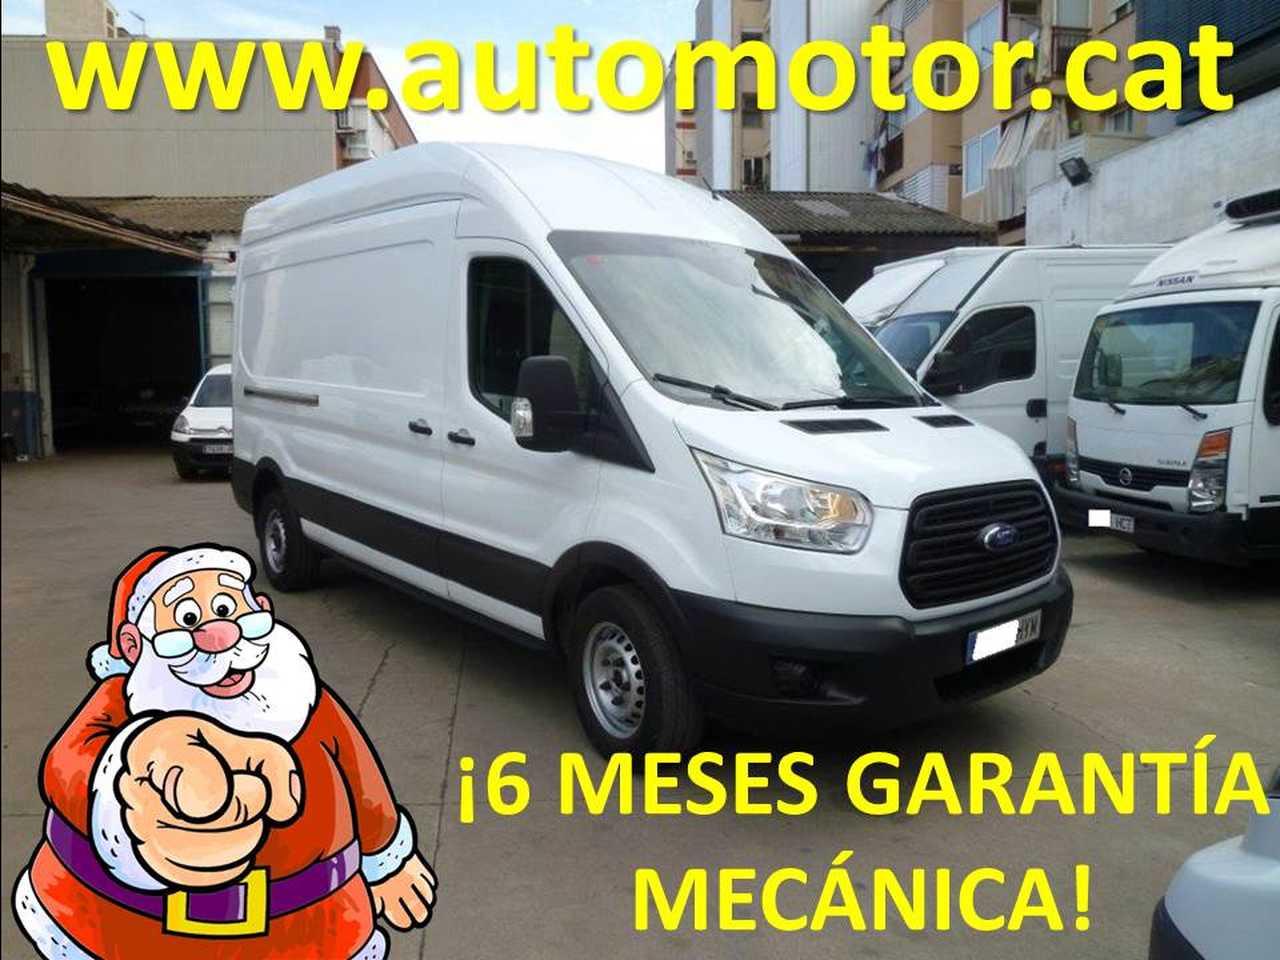 Ford Transit  Furgon FT 350 L2 H3 Van Ambiente 100 - 6 MESES GARANTIA MECANICA  - Foto 1